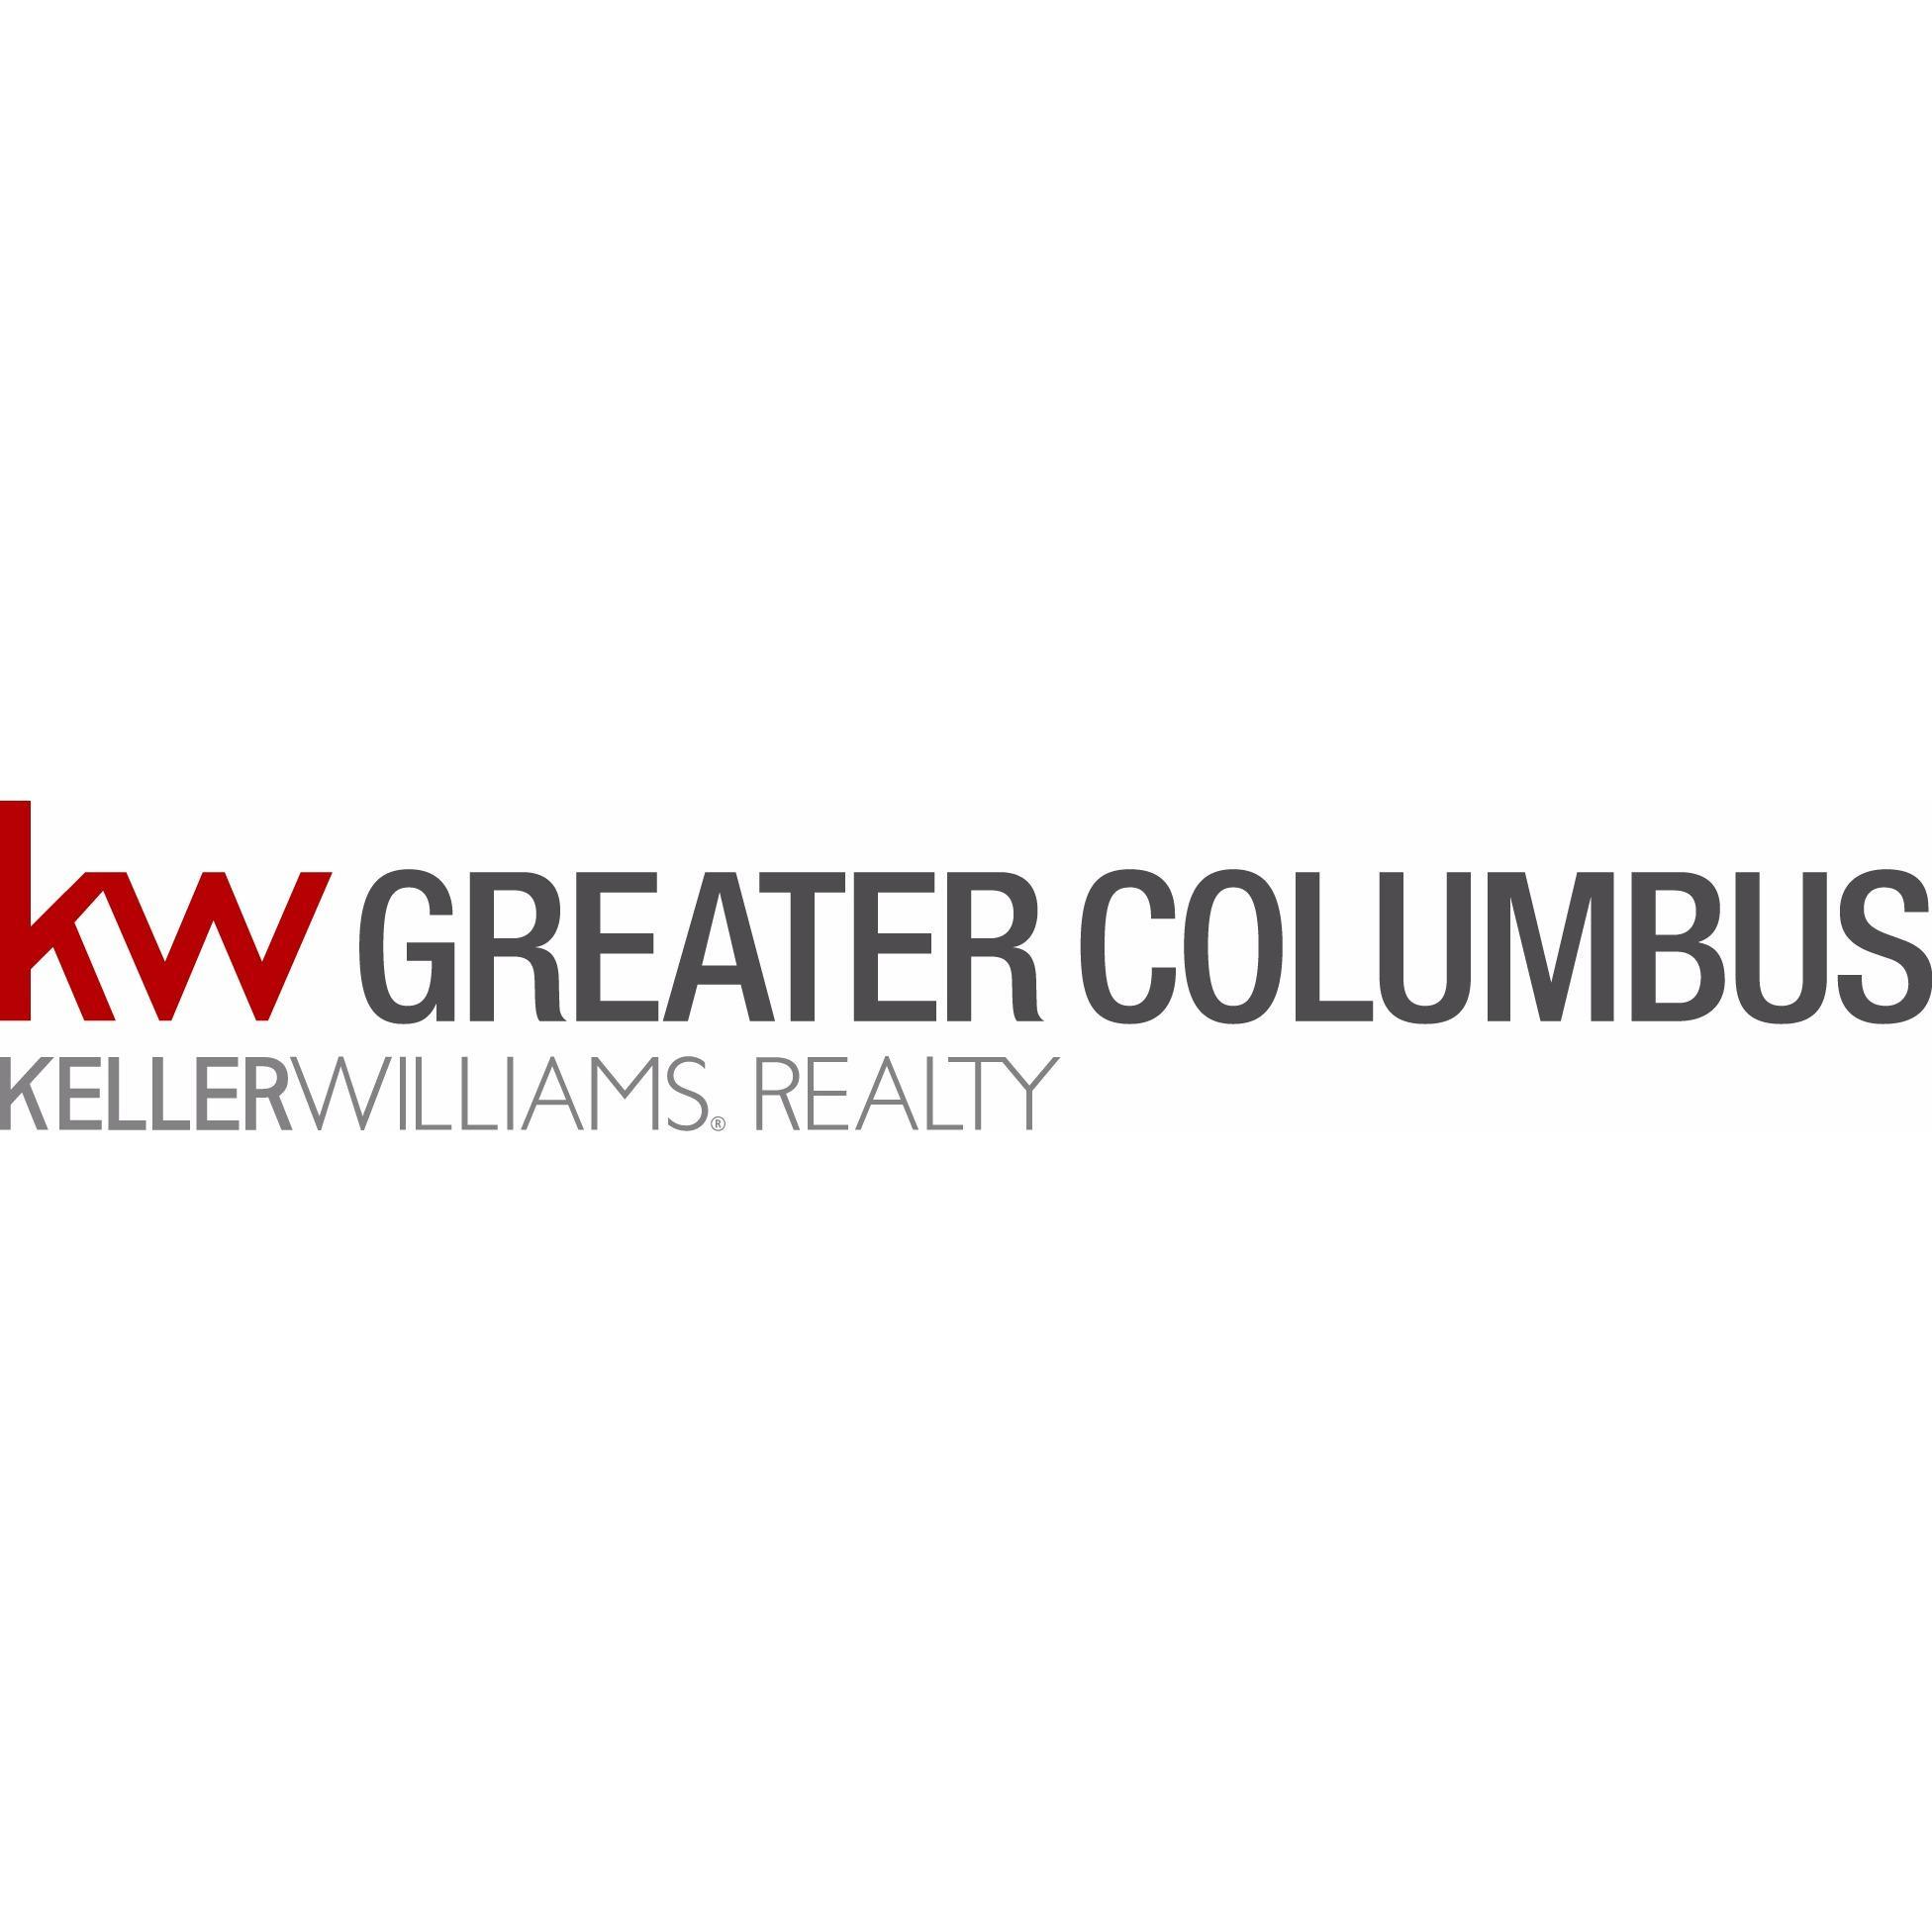 Mic Gordon, Keller Williams Greater Columbus Realty